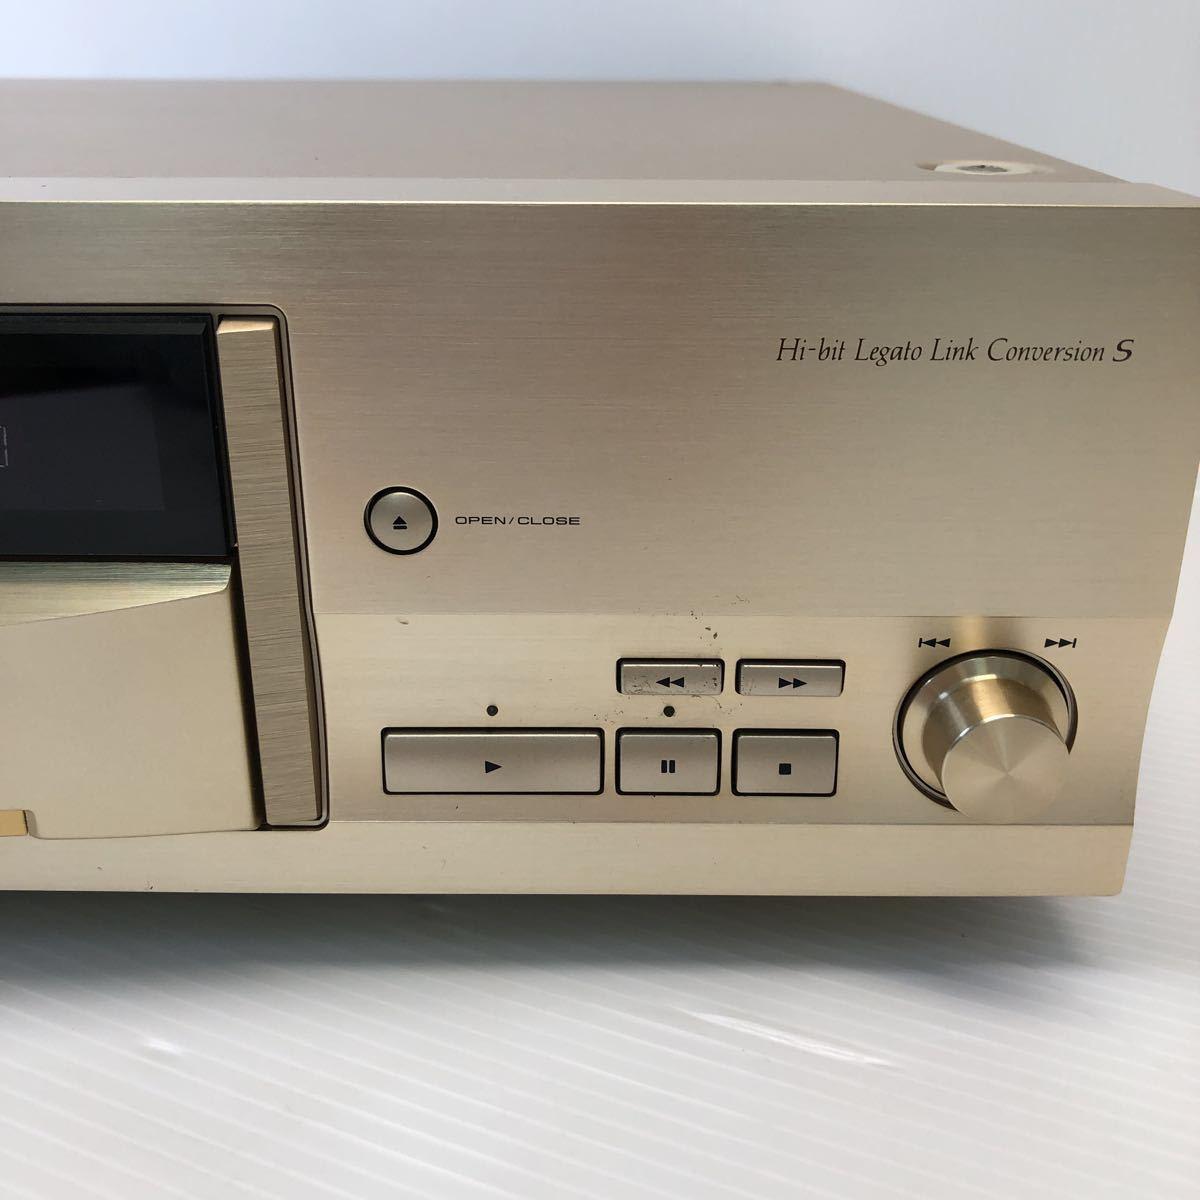 Pioneer パイオニア CDプレーヤー DACモード搭載 通電 CDトレイオープンクローズのみ確認 ジャンク扱い リモコン付き 1円スタート_画像4